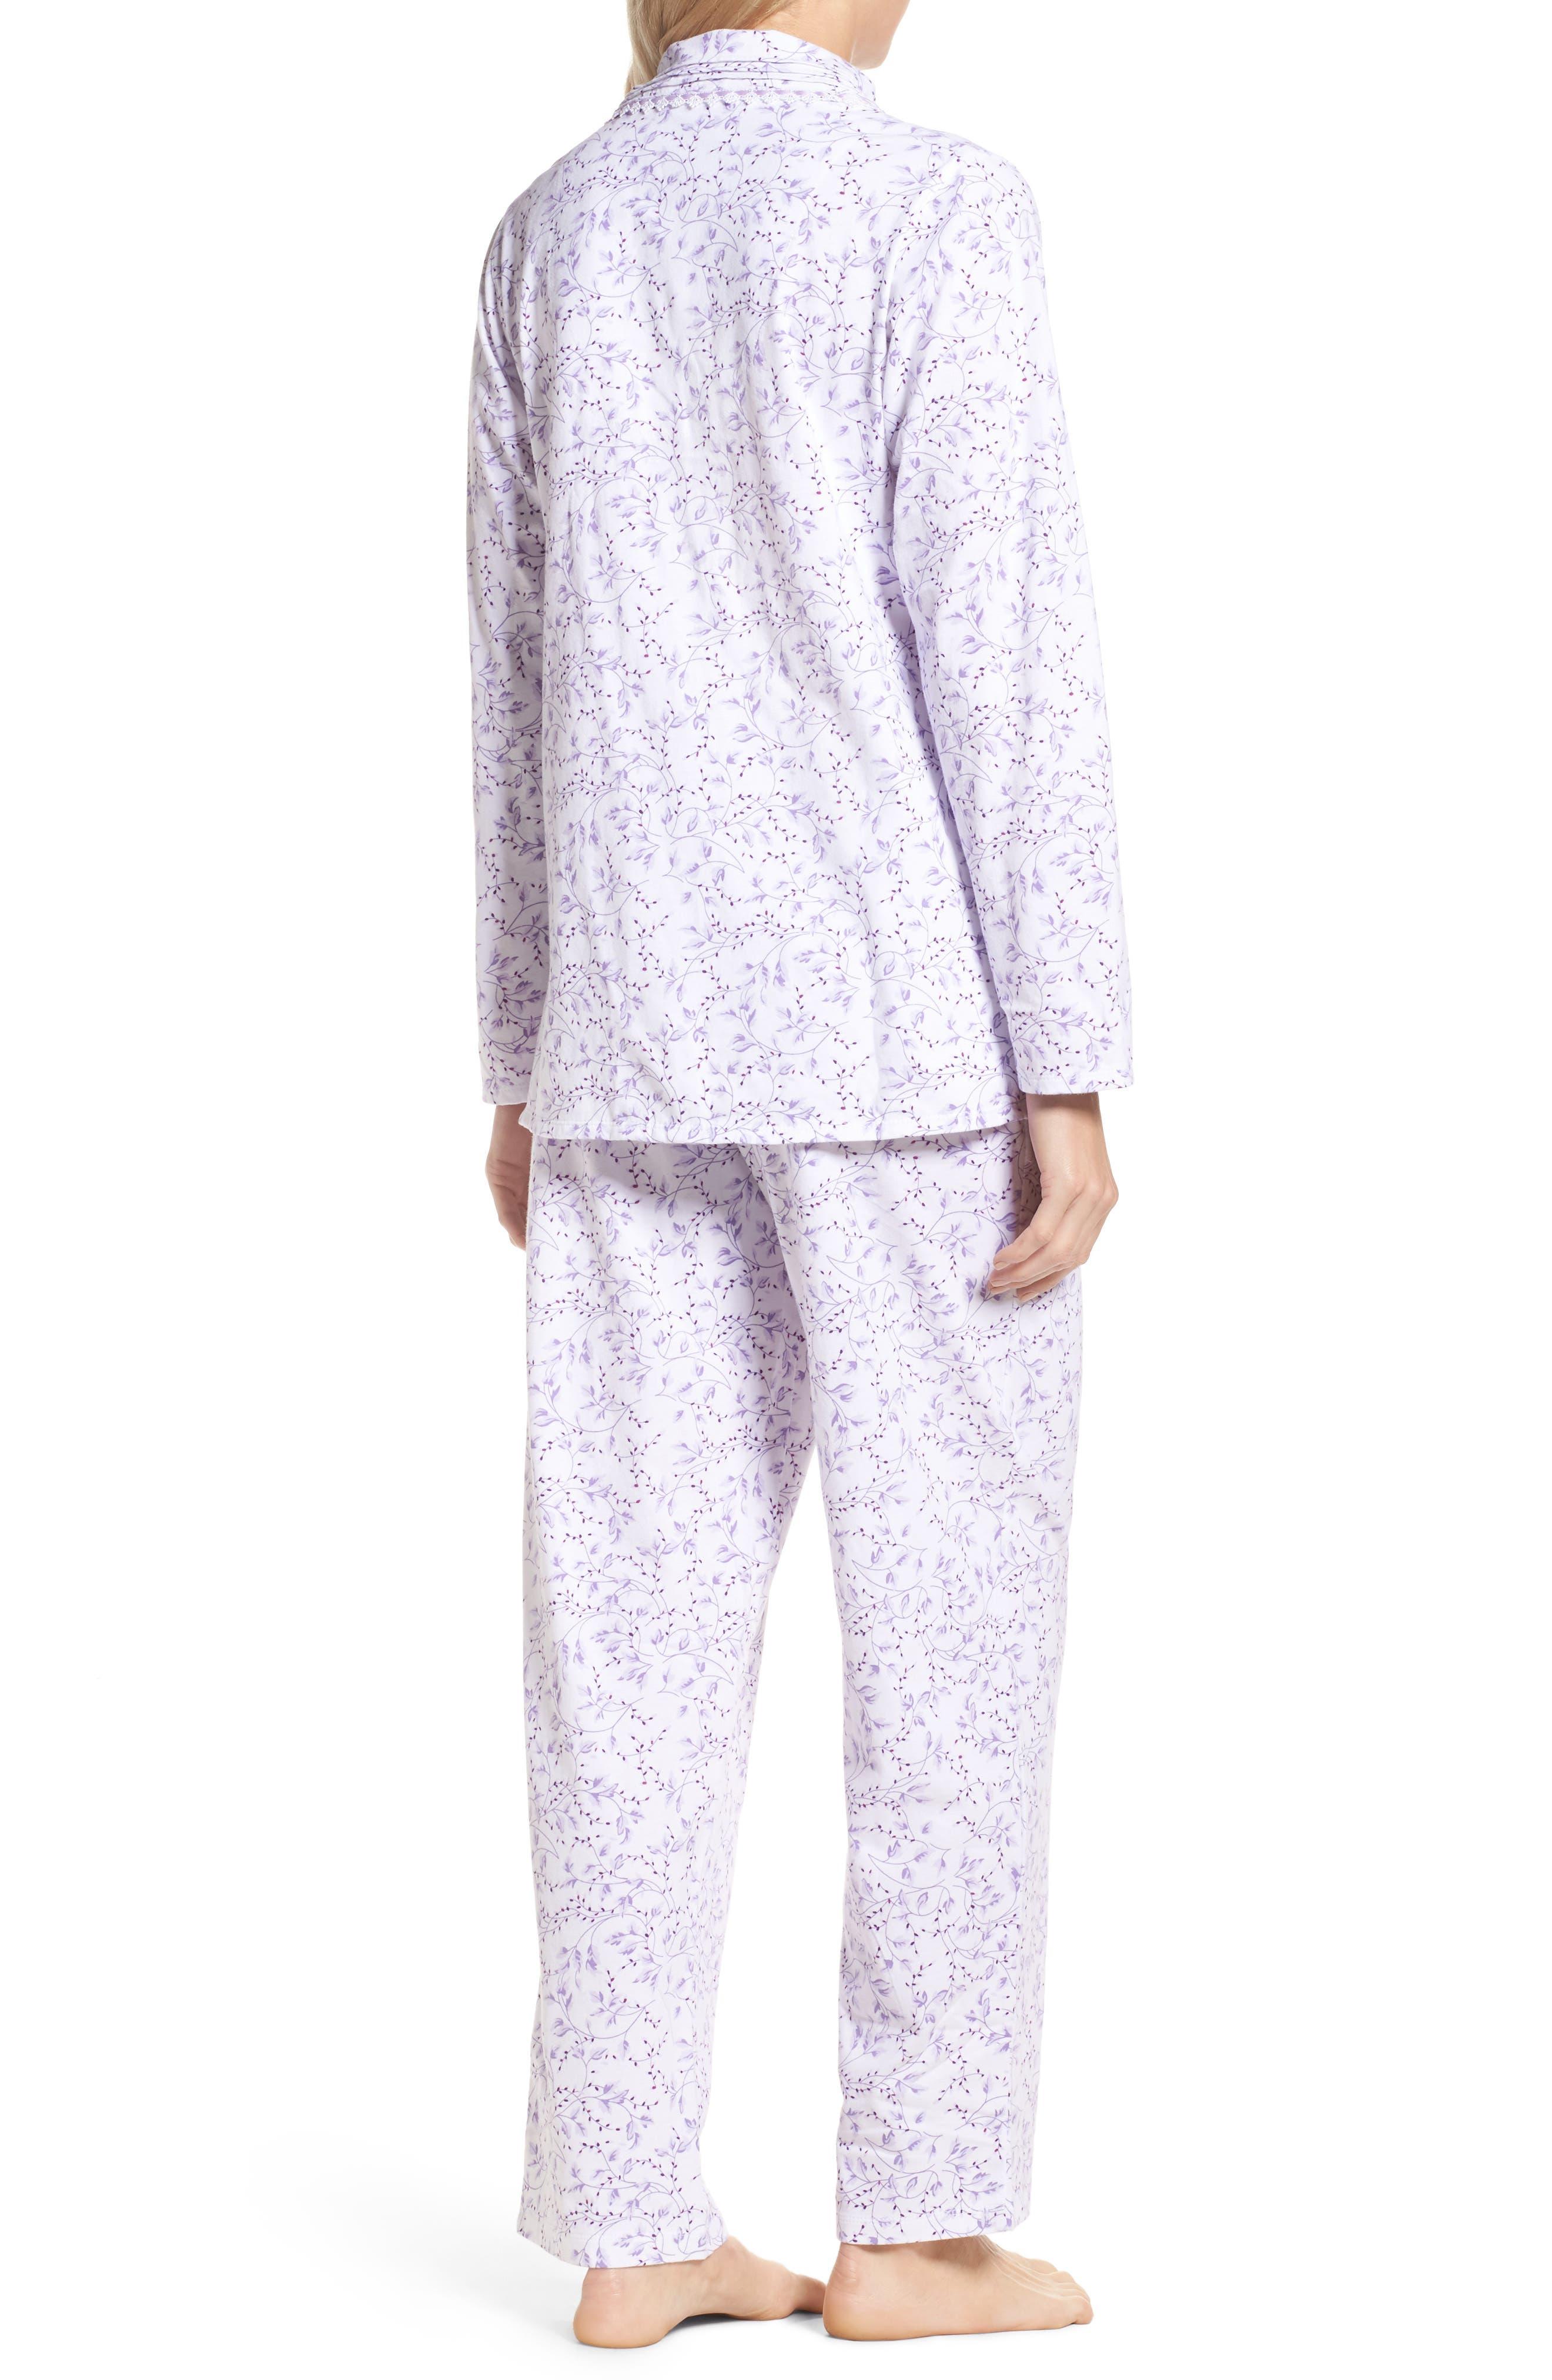 Notch Collar Pajamas,                             Alternate thumbnail 2, color,                             110